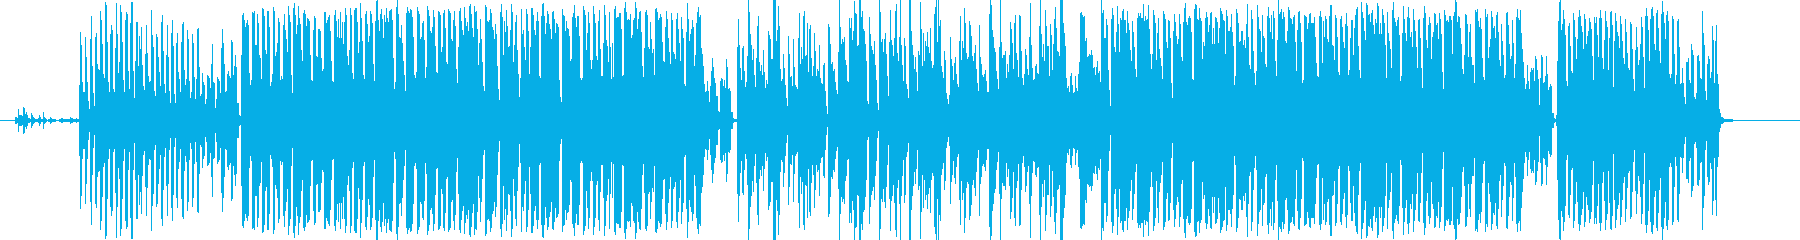 RPMの再生済みの波形